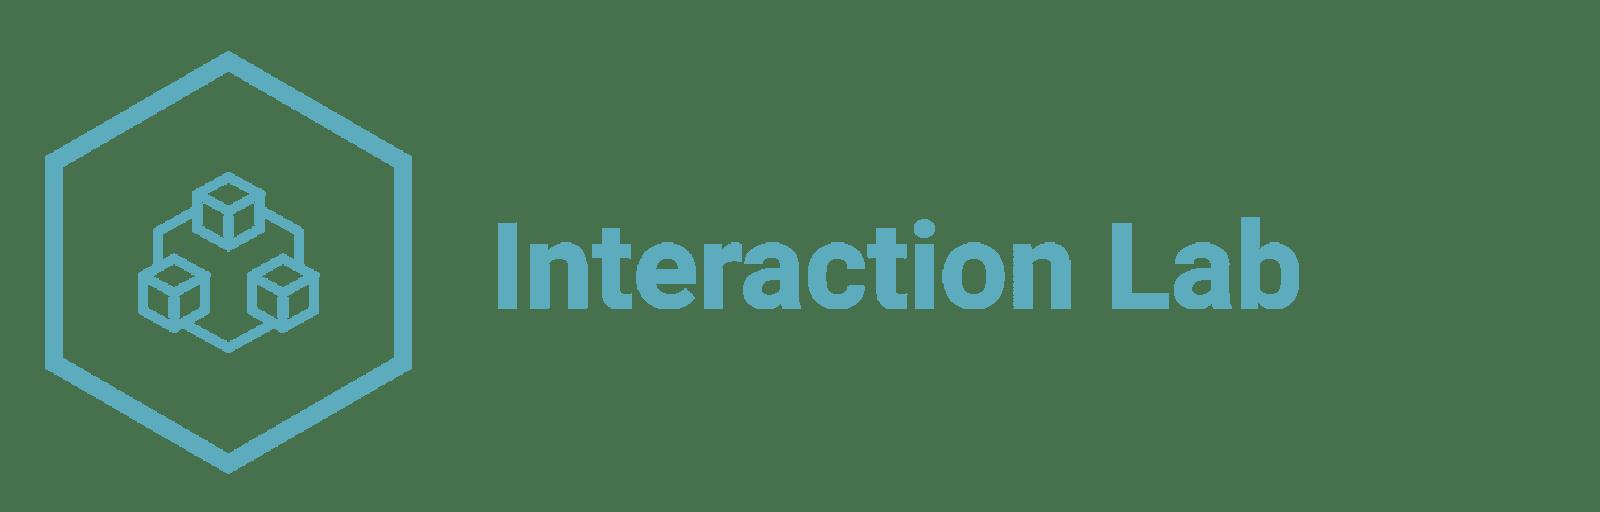 Interactive Technologies Lab (intLab)